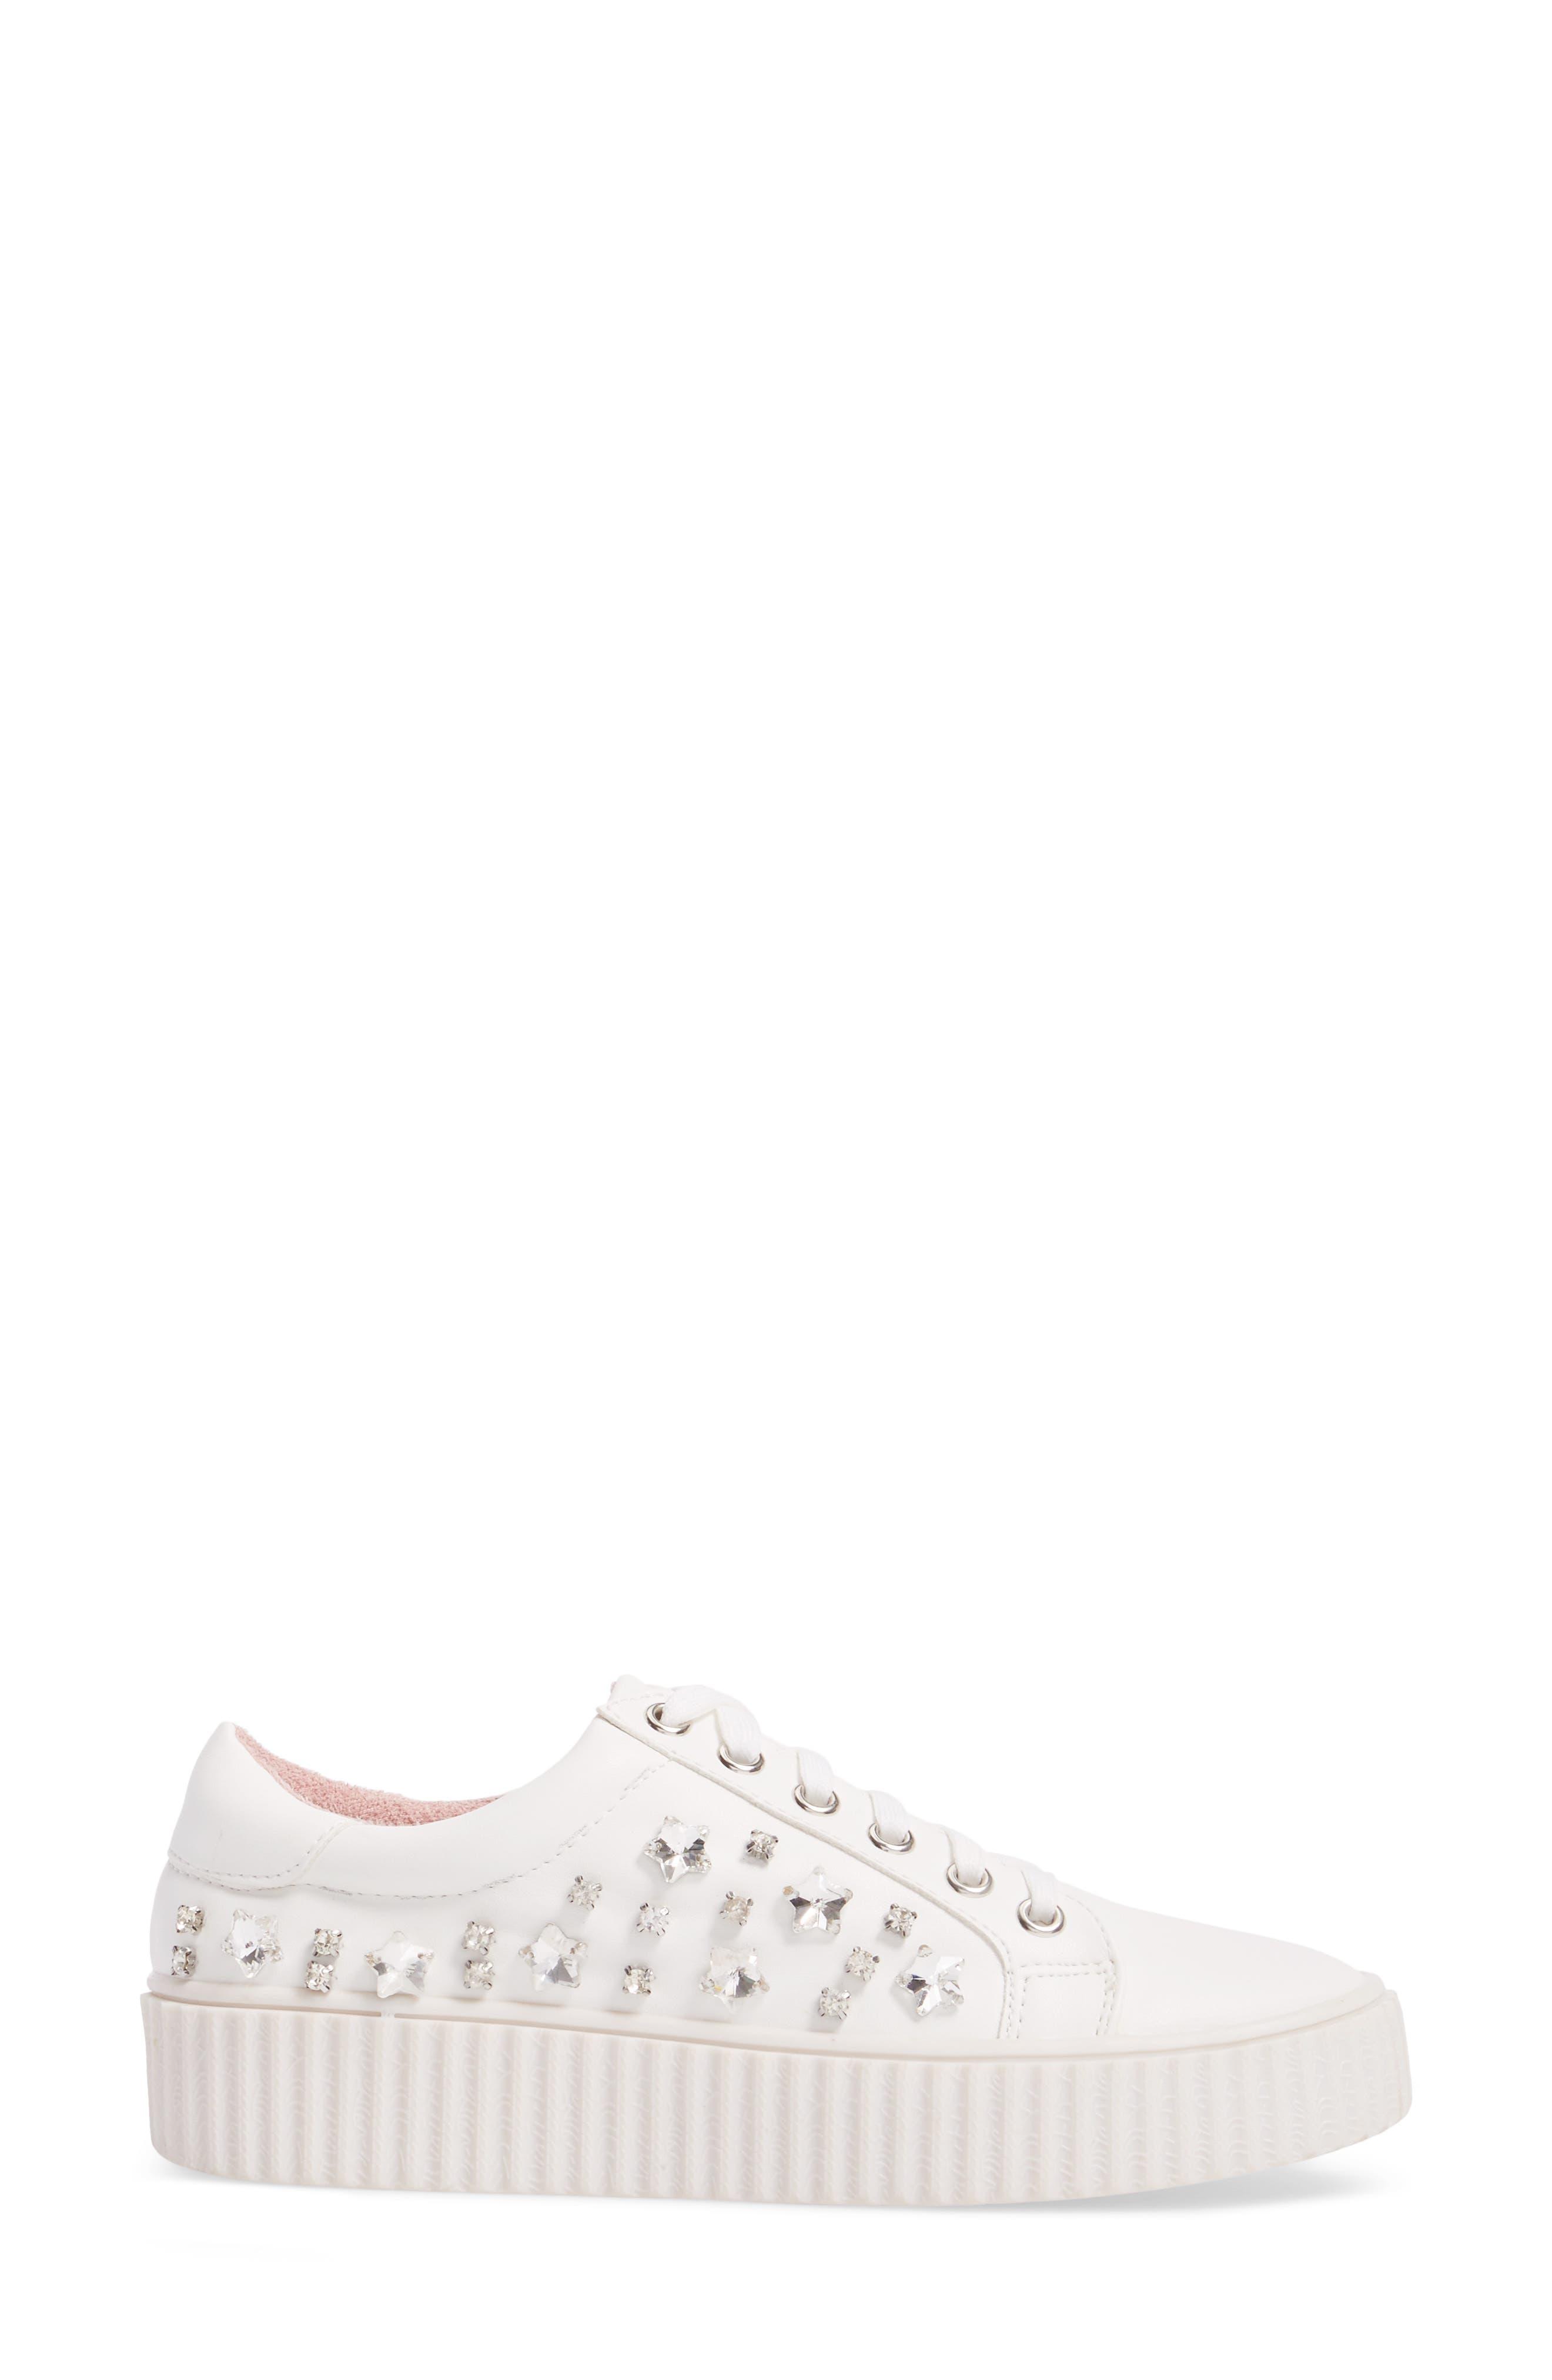 Pam Embellished Platform Sneaker,                             Alternate thumbnail 3, color,                             White